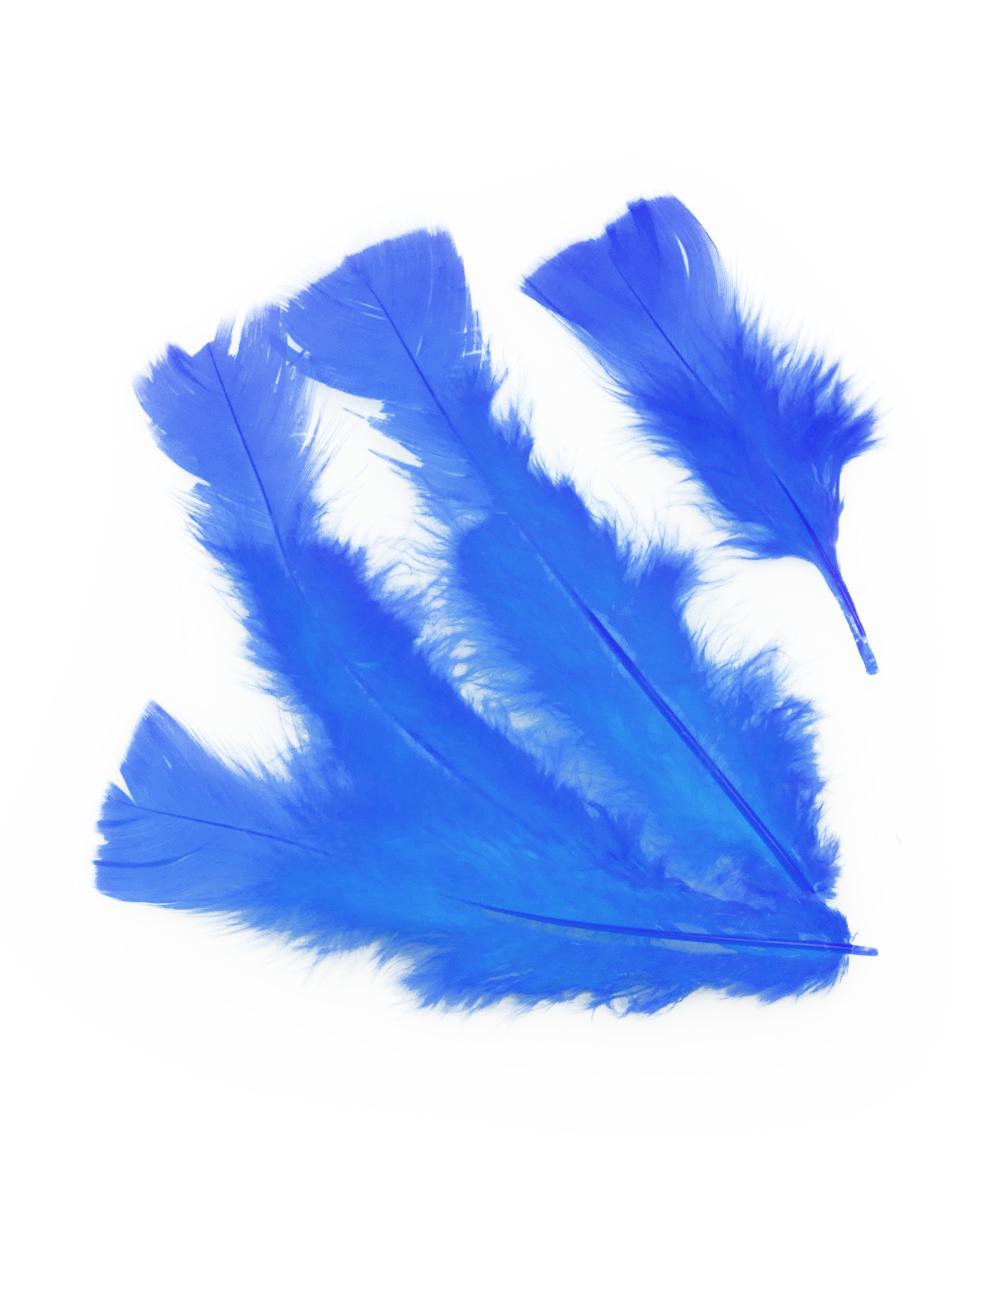 Kostuemzubehor Federn 100er-Pack blau